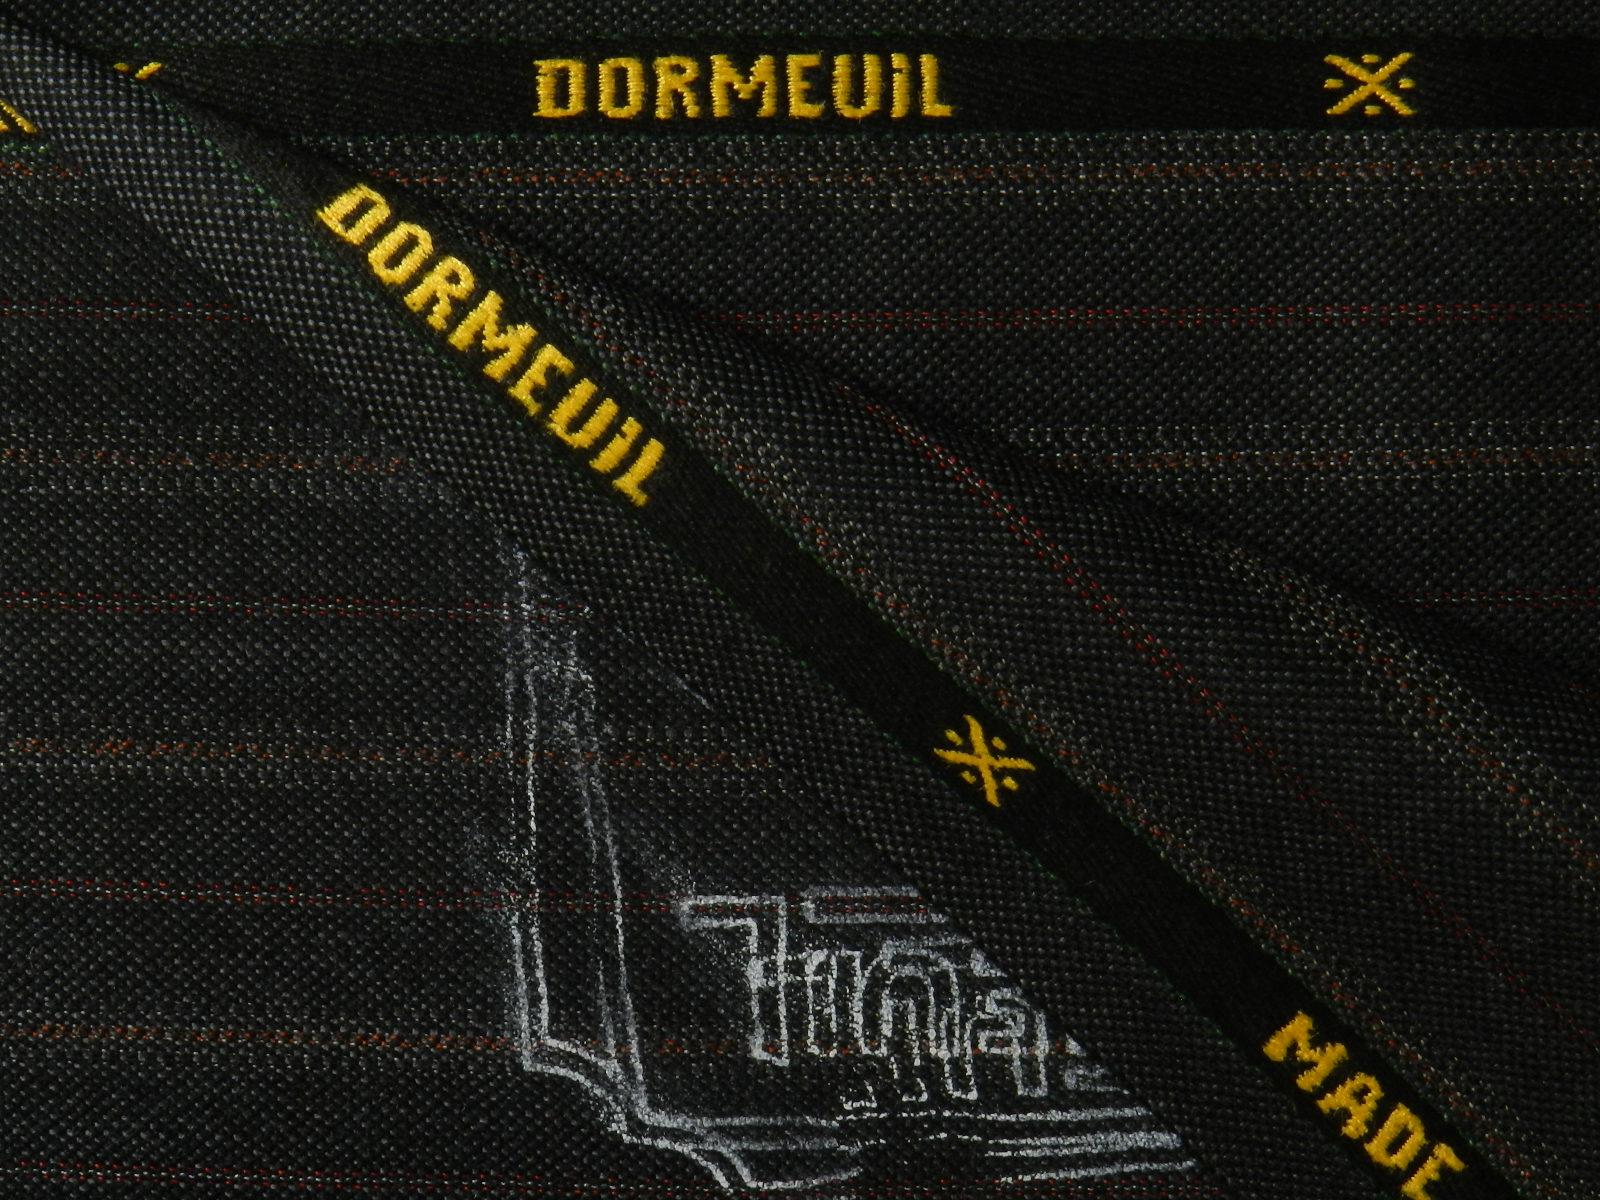 DORMEUIL(ドーメル) / ENGLAND / ブラック 系 / ストライプ 系